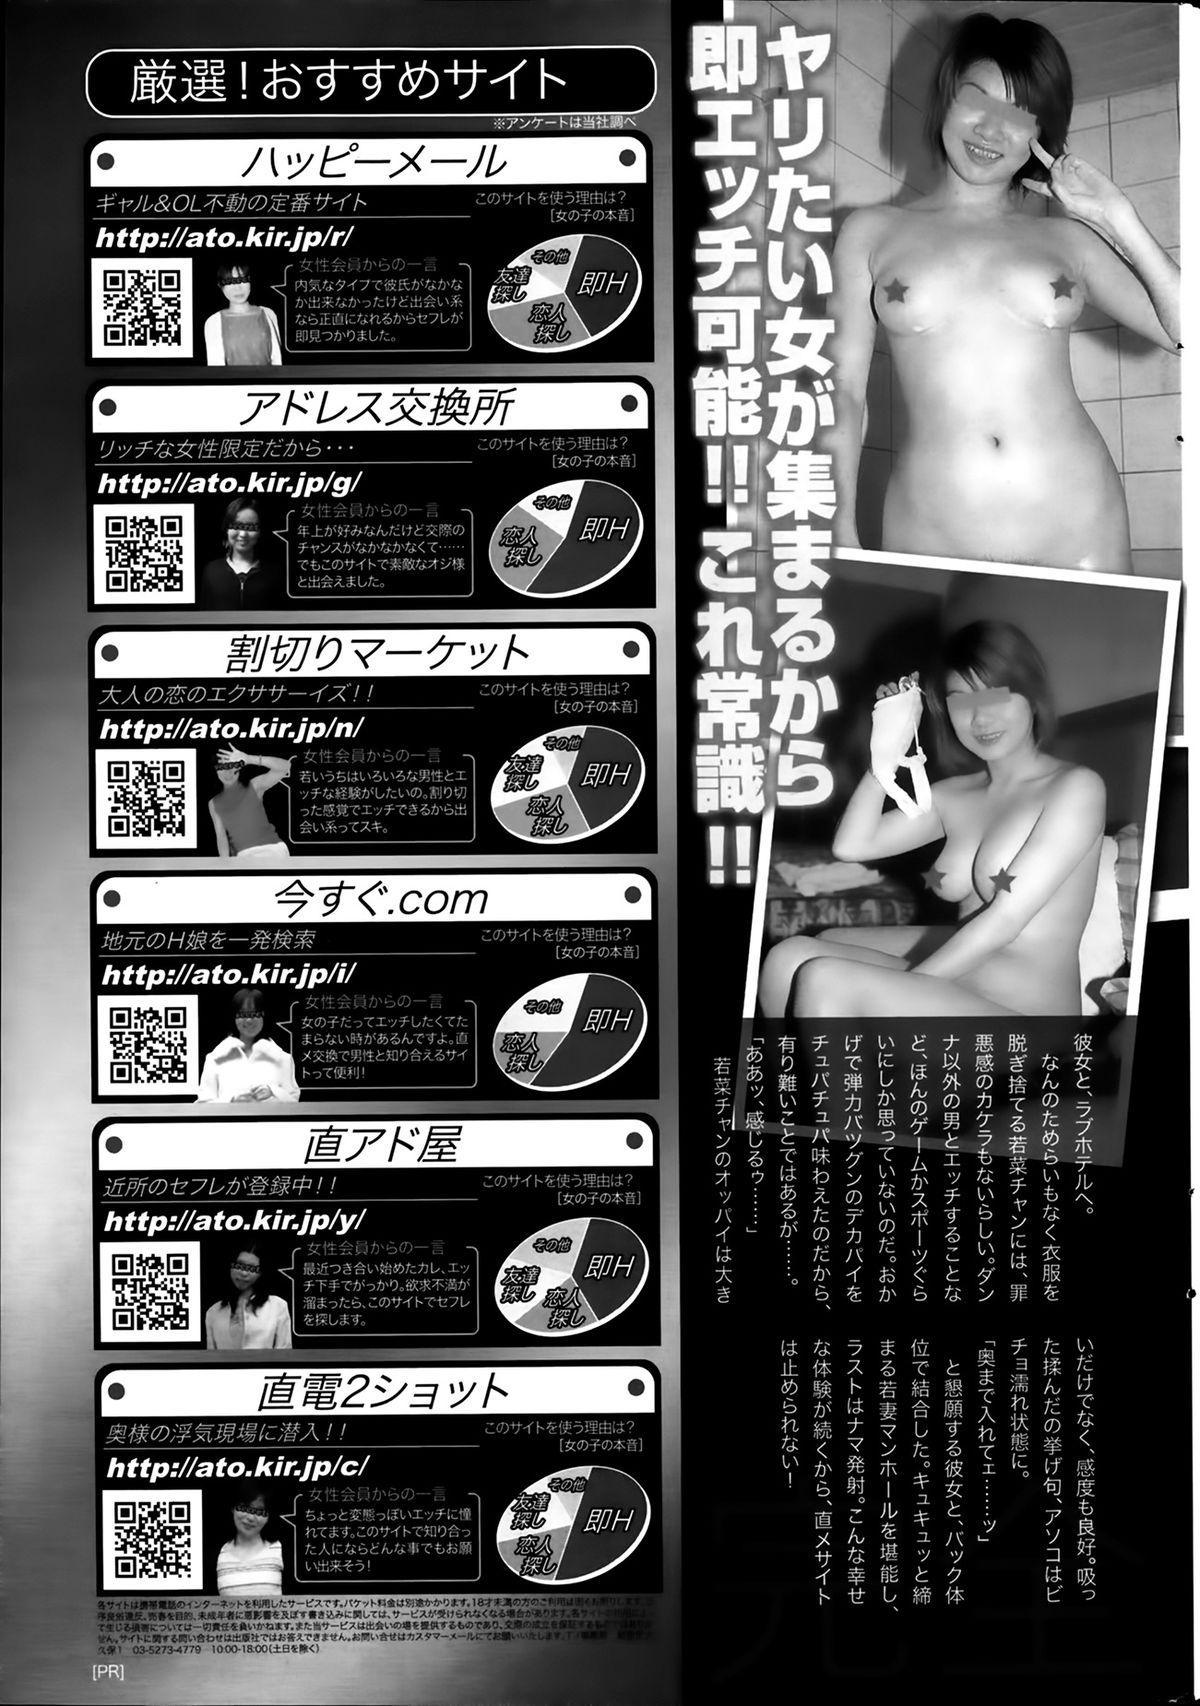 COMIC SIGMA 2014-03 Vol.78 265